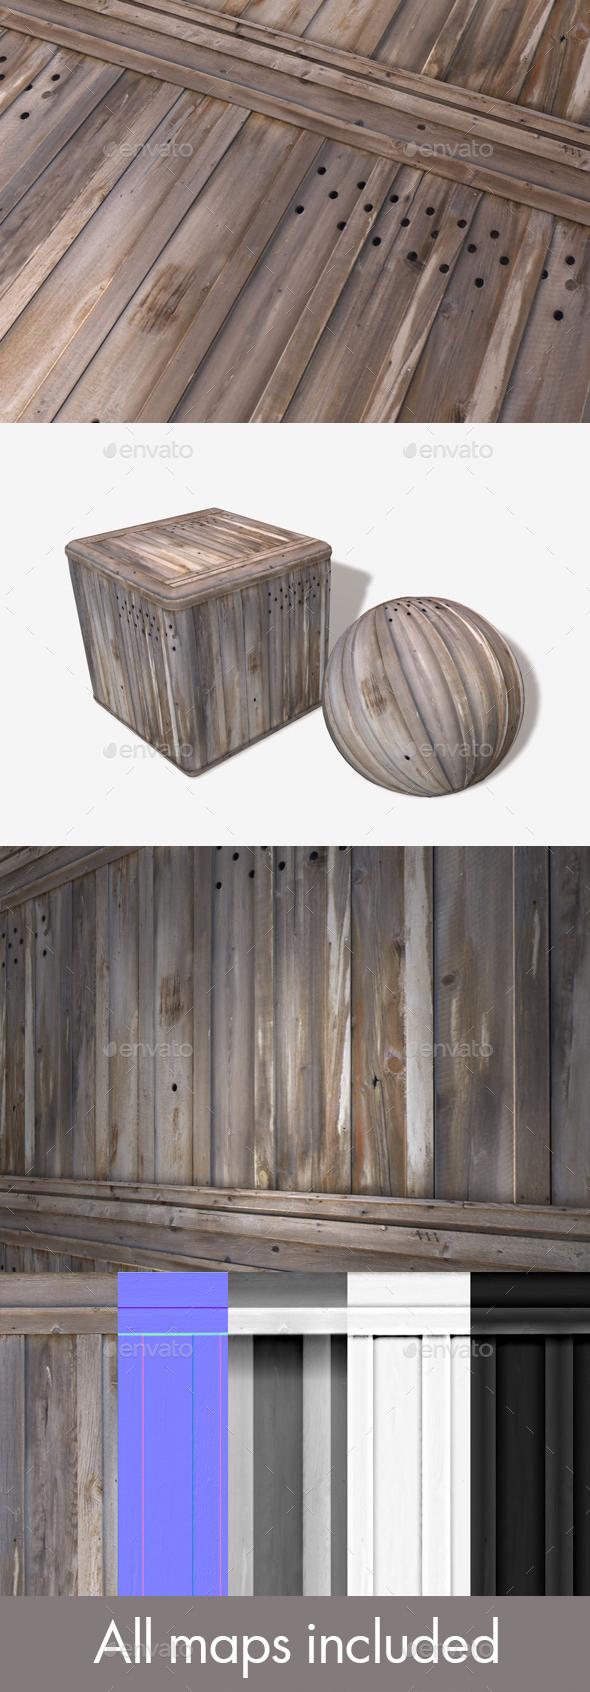 3DOcean Scrap Wooden Planks Seamless Texture 20757812